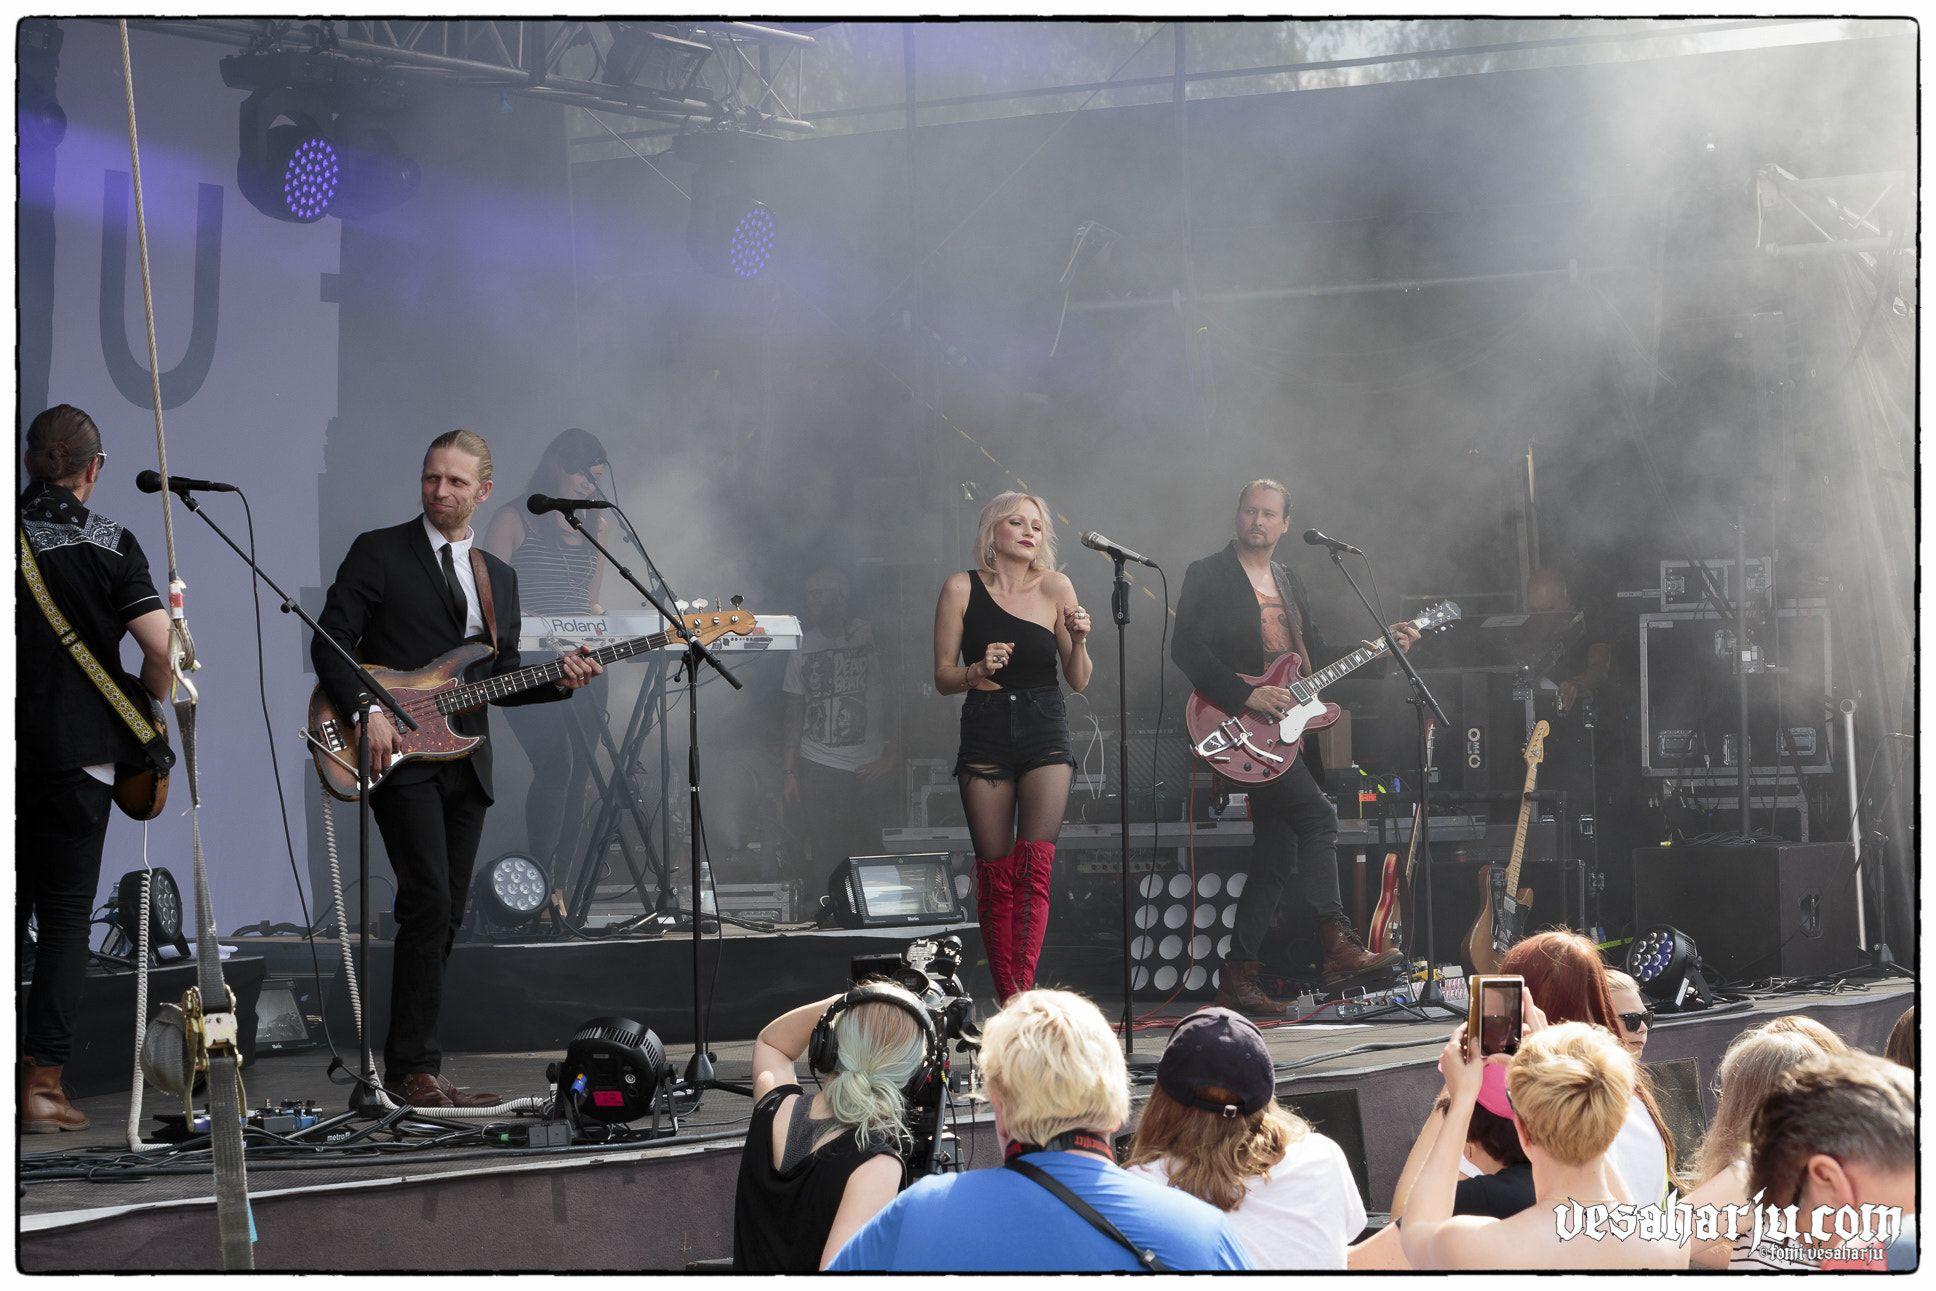 Chisu   Riihimäki Rock 2016   Riihimäki - Chisu live at Riihimäki Rock, Riihimäki, Finland 2016